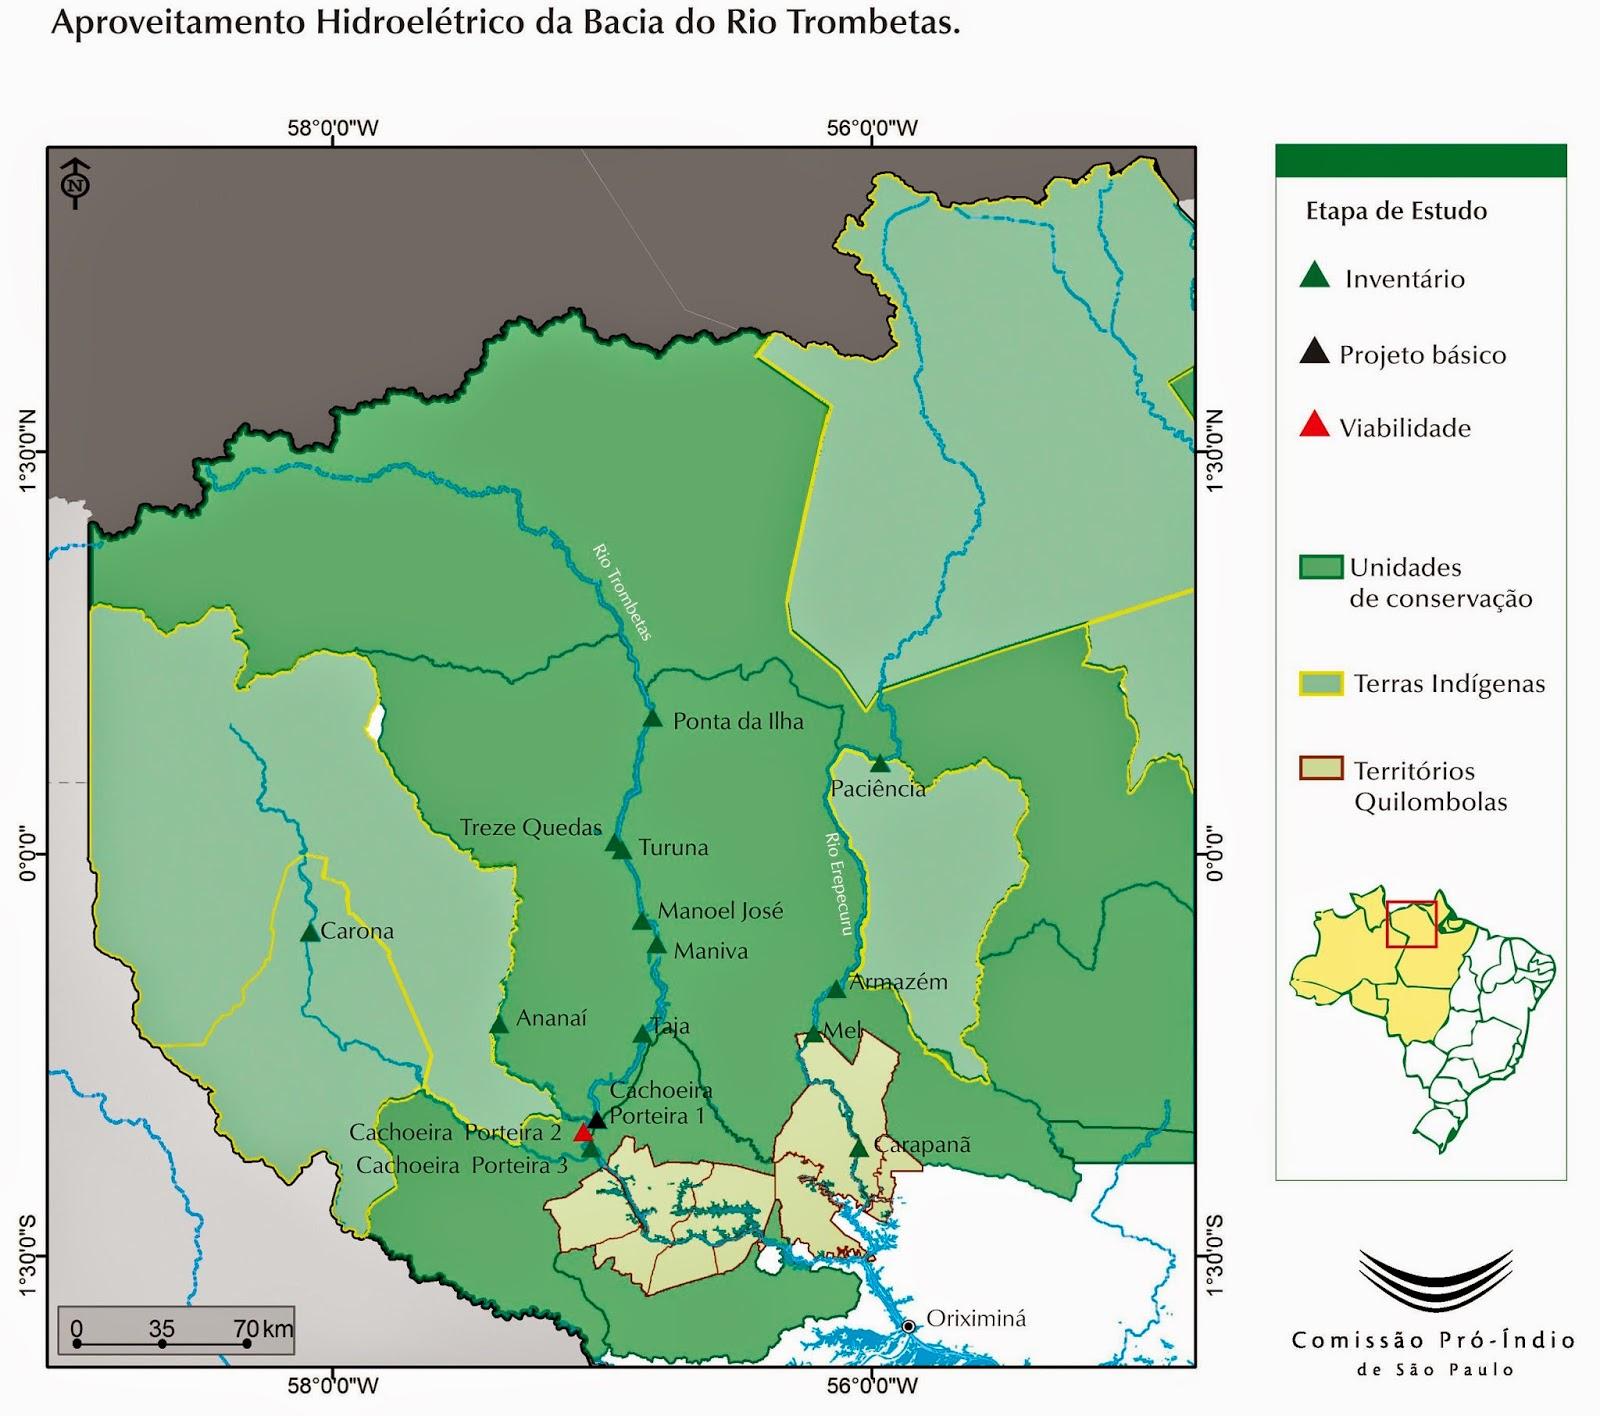 http://www.quilombo.org.br/#!Hidroeltricas-em-Estudo/zoom/c1jy5/imagey3m